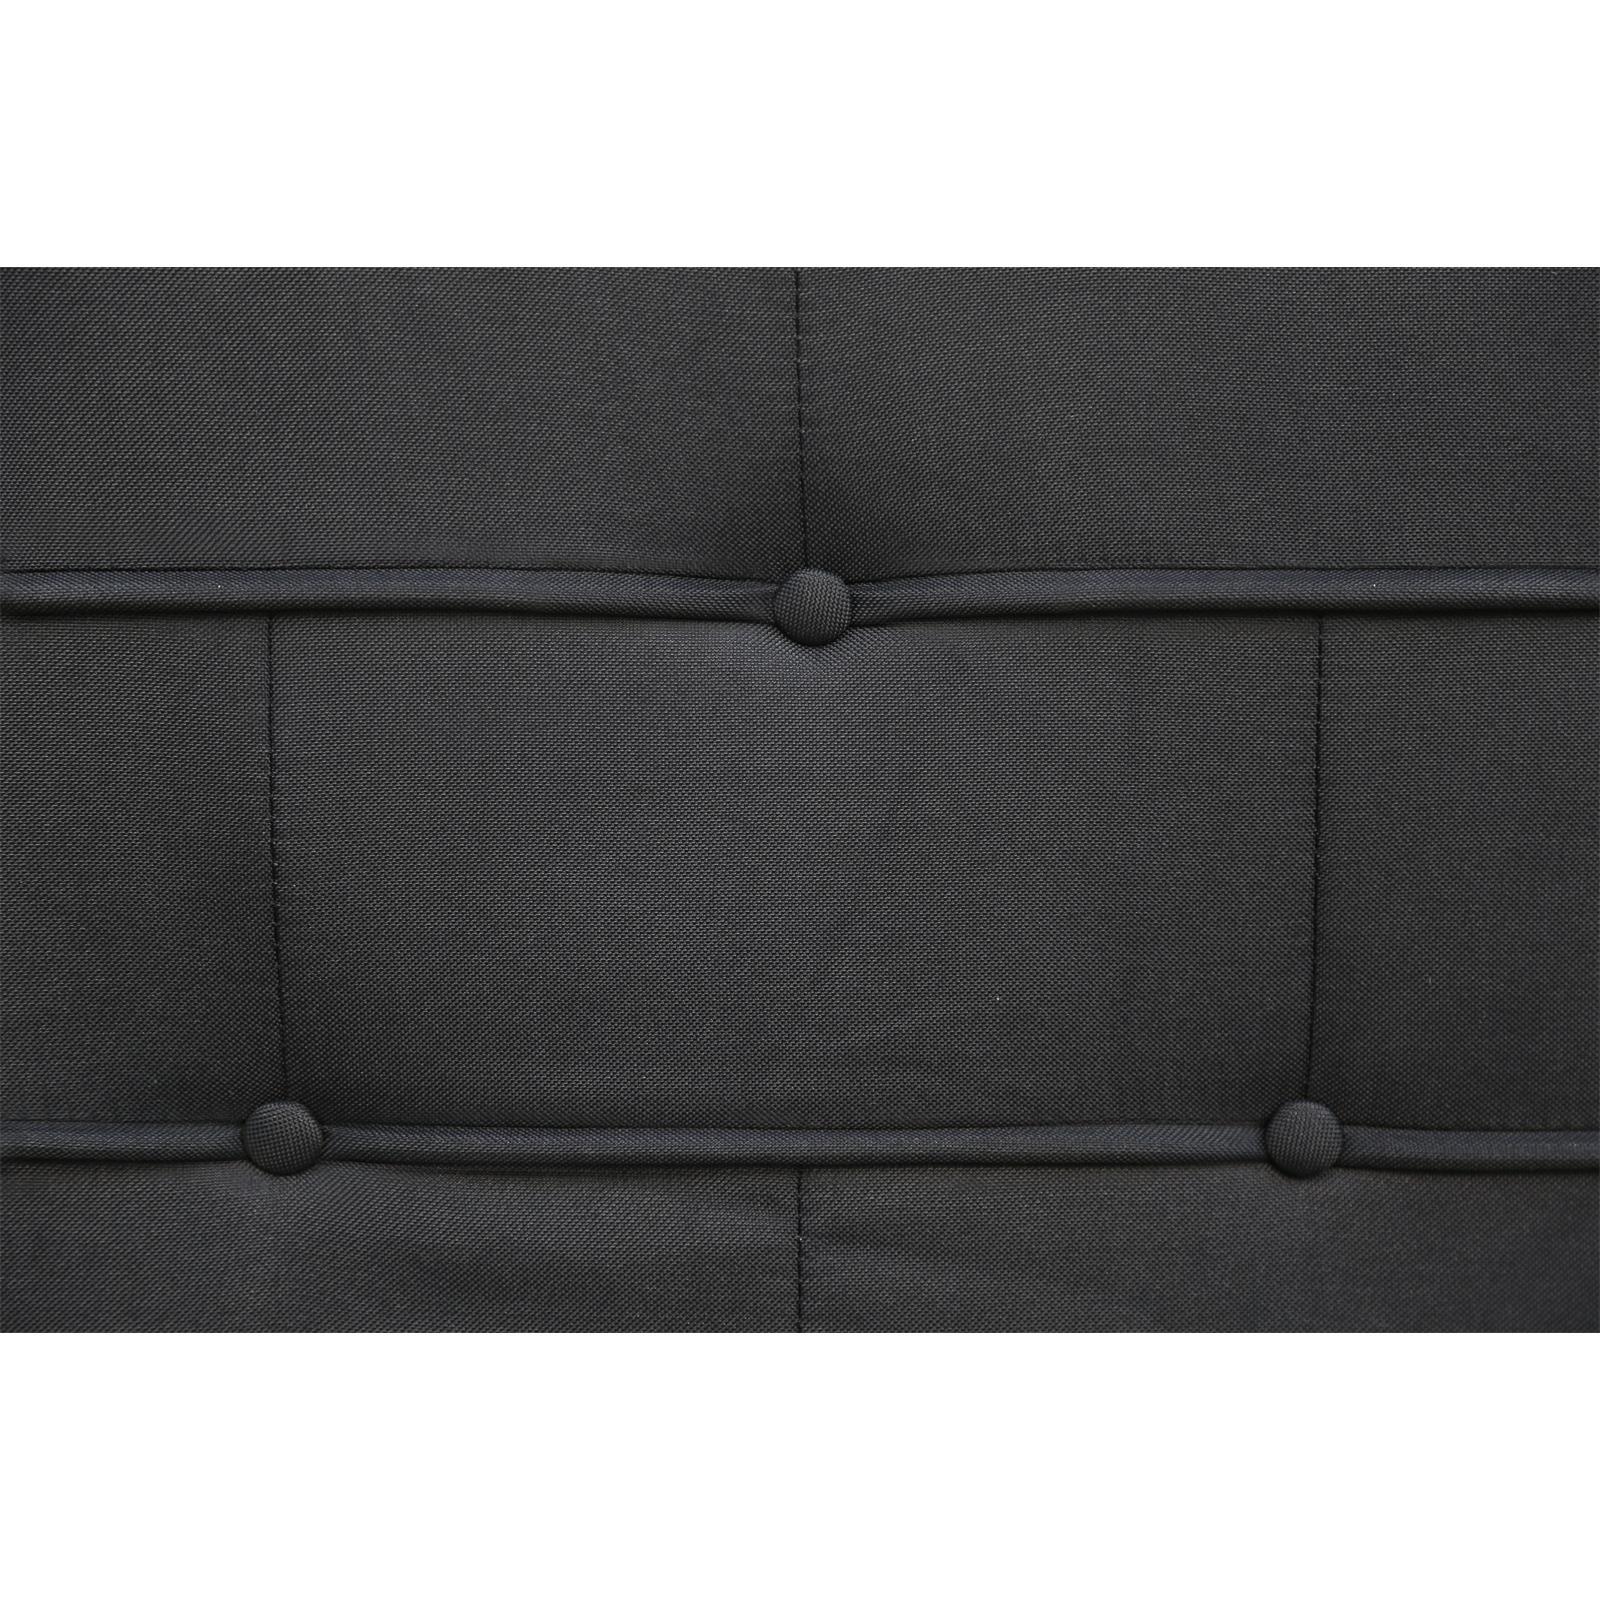 polsterbett einzelbett 120 x 200 cm inkl lattenrost jugendbett bettgestell ebay. Black Bedroom Furniture Sets. Home Design Ideas